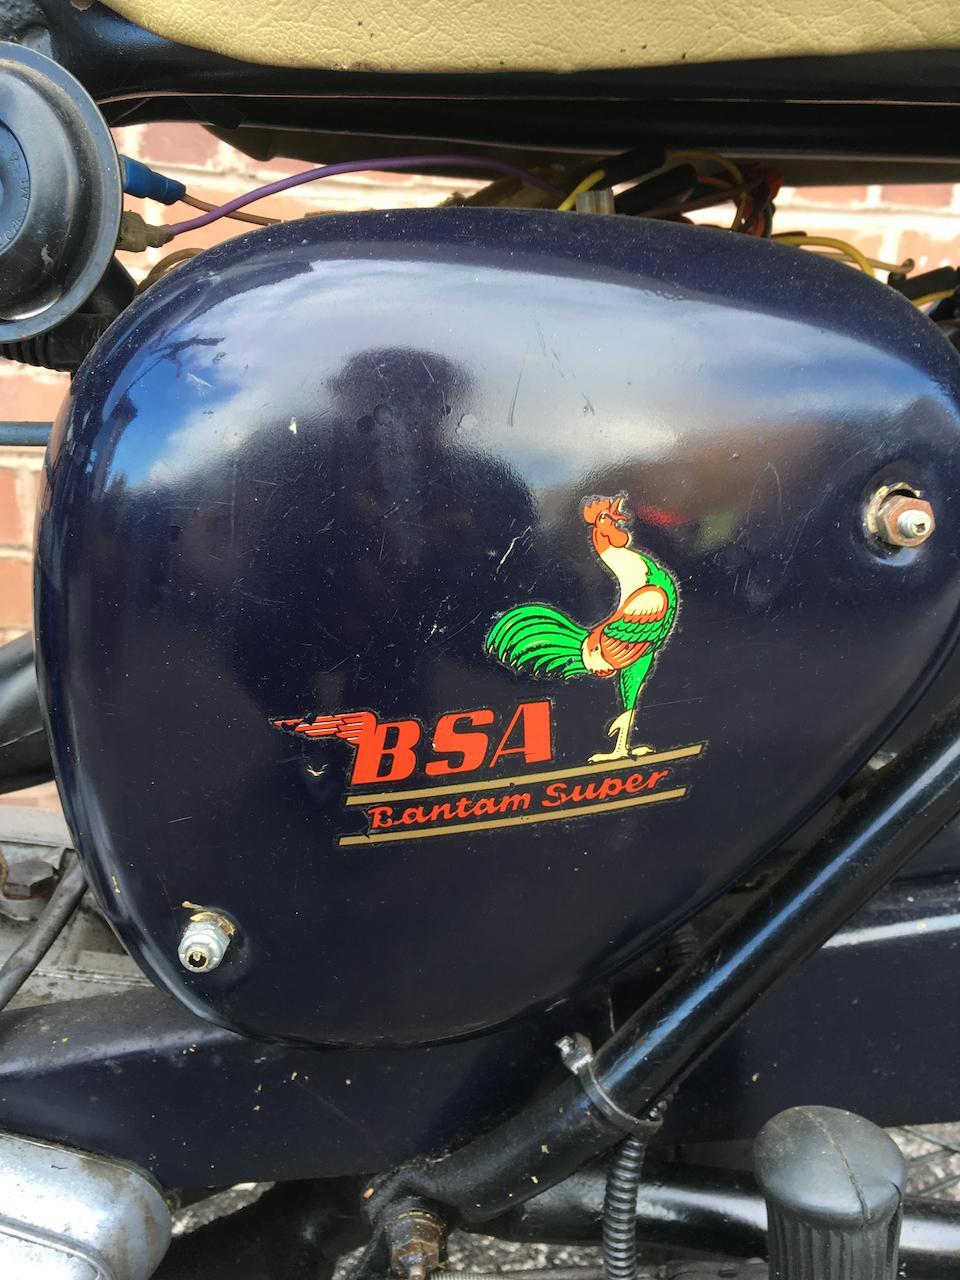 1968 BSA 172cc D14 Bantam Frame no. D14B 1012R Engine no. D14B 1021R